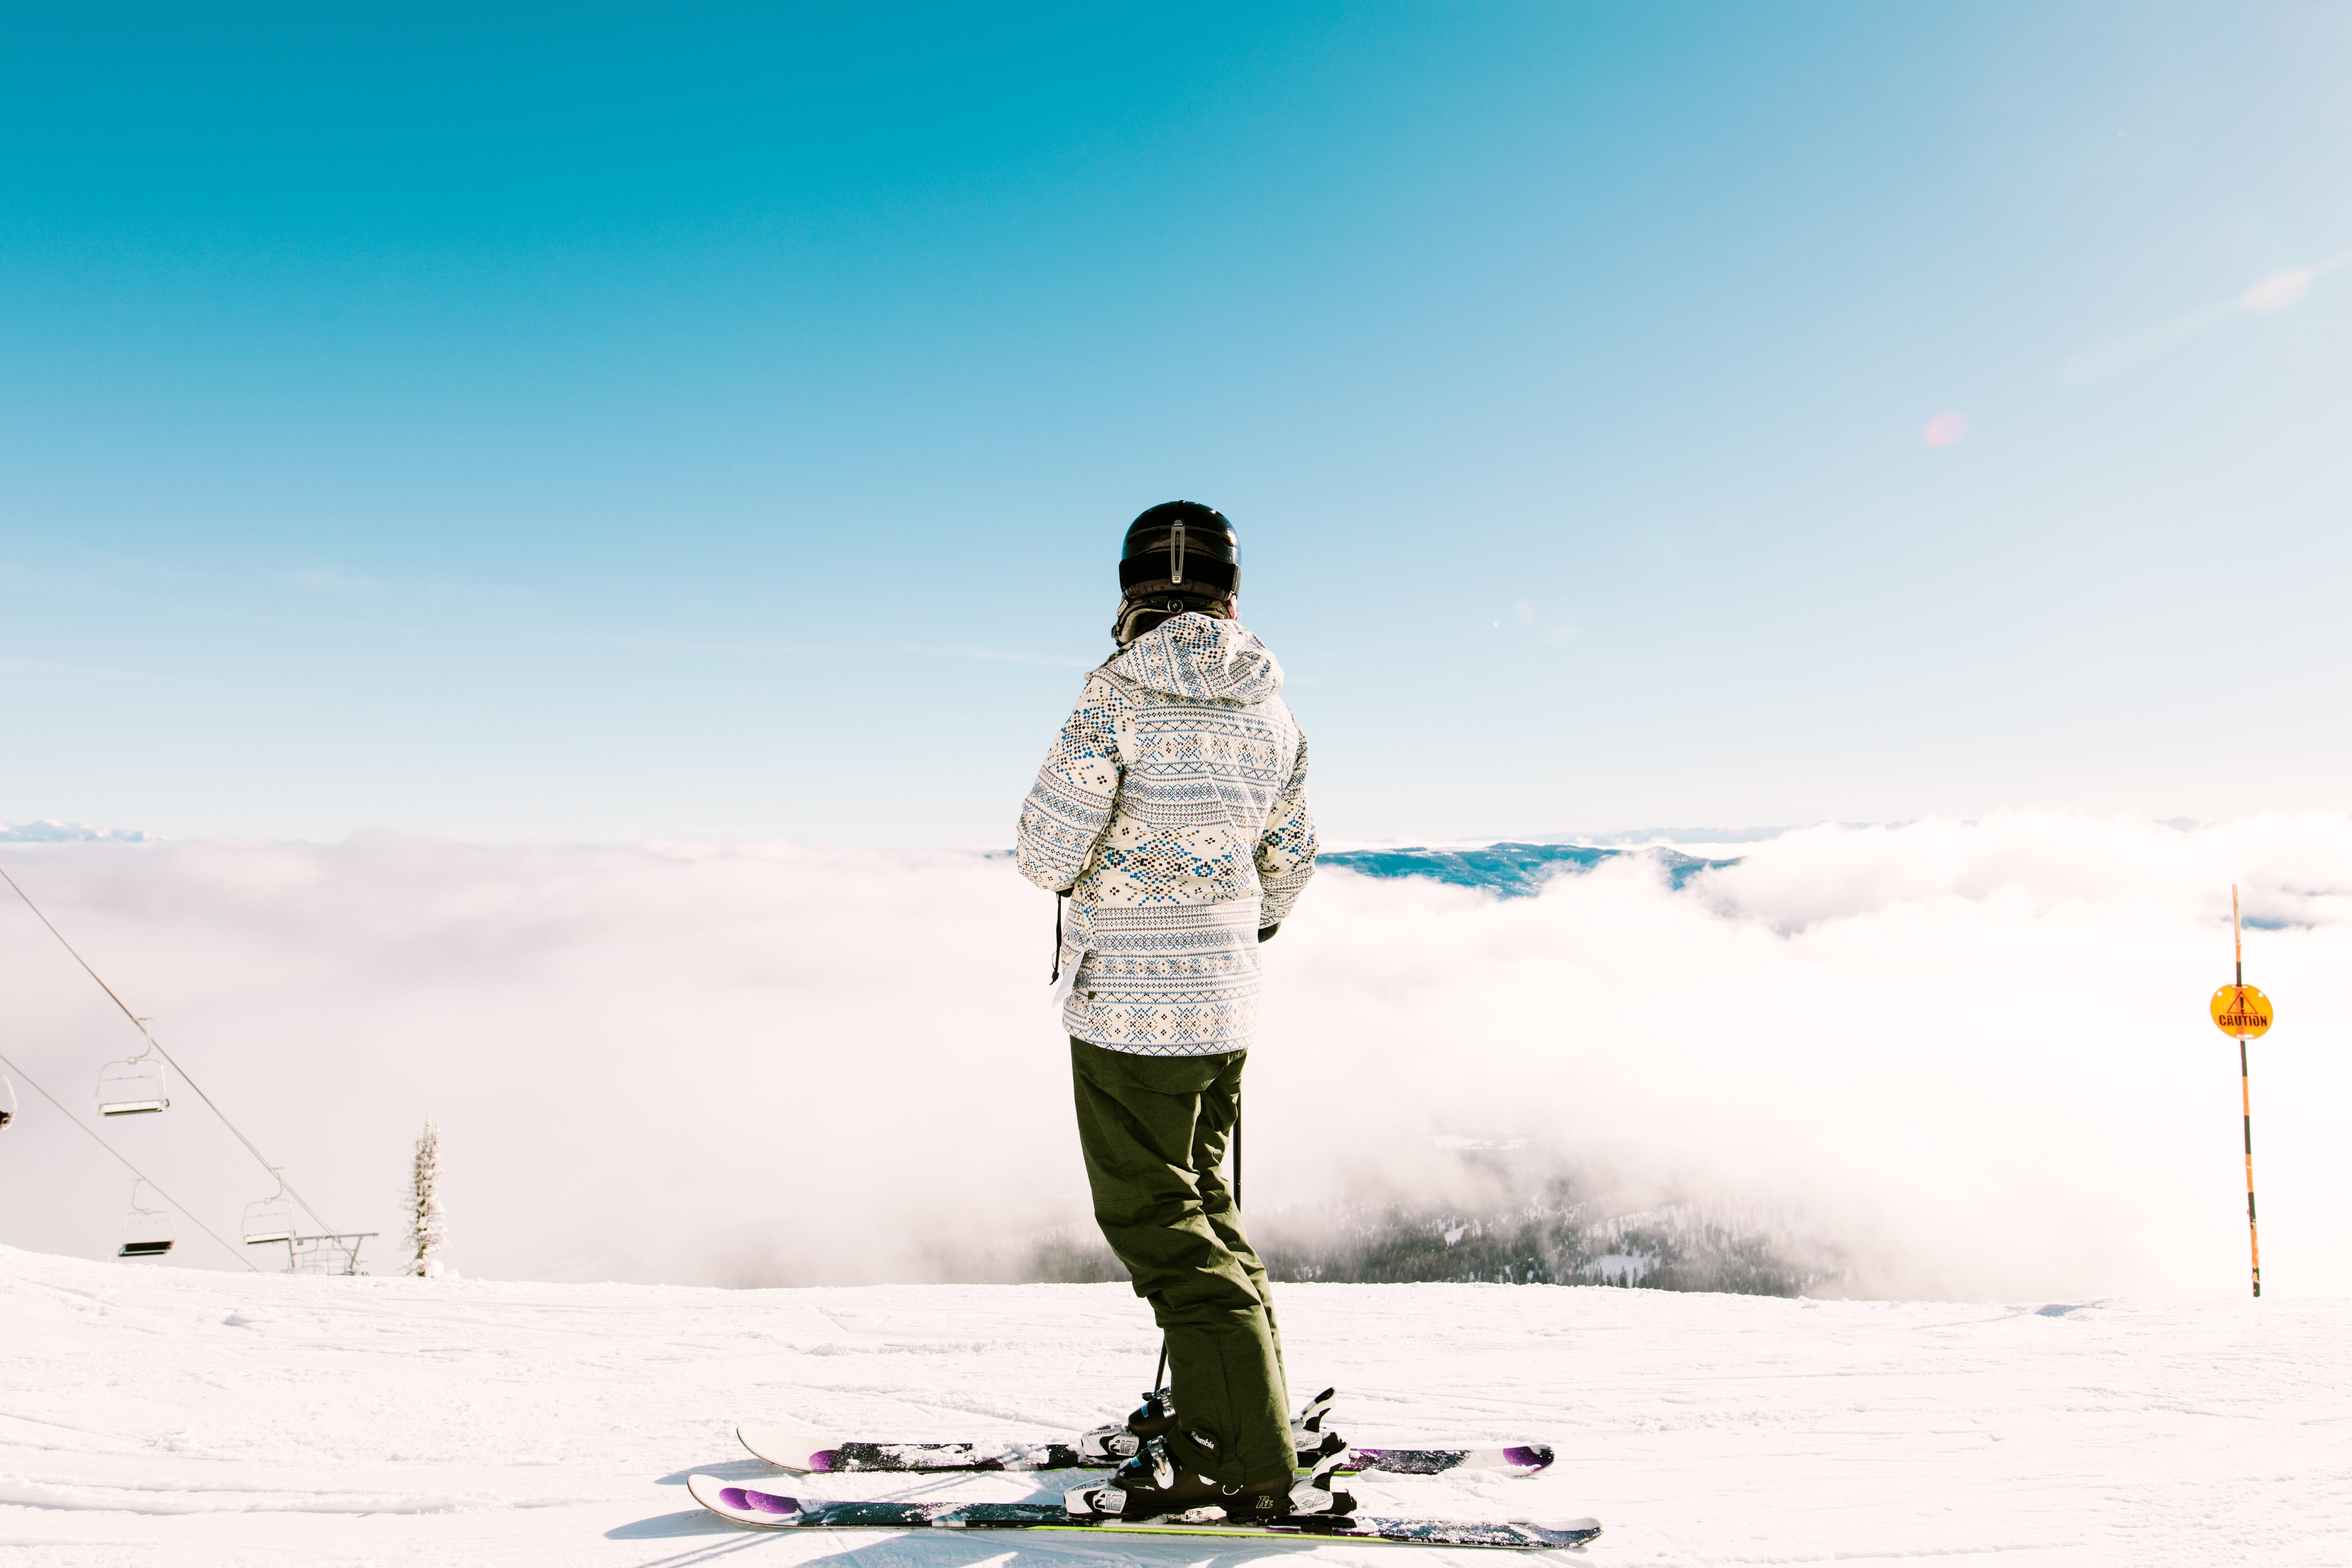 Montana Skier's Gift Guide